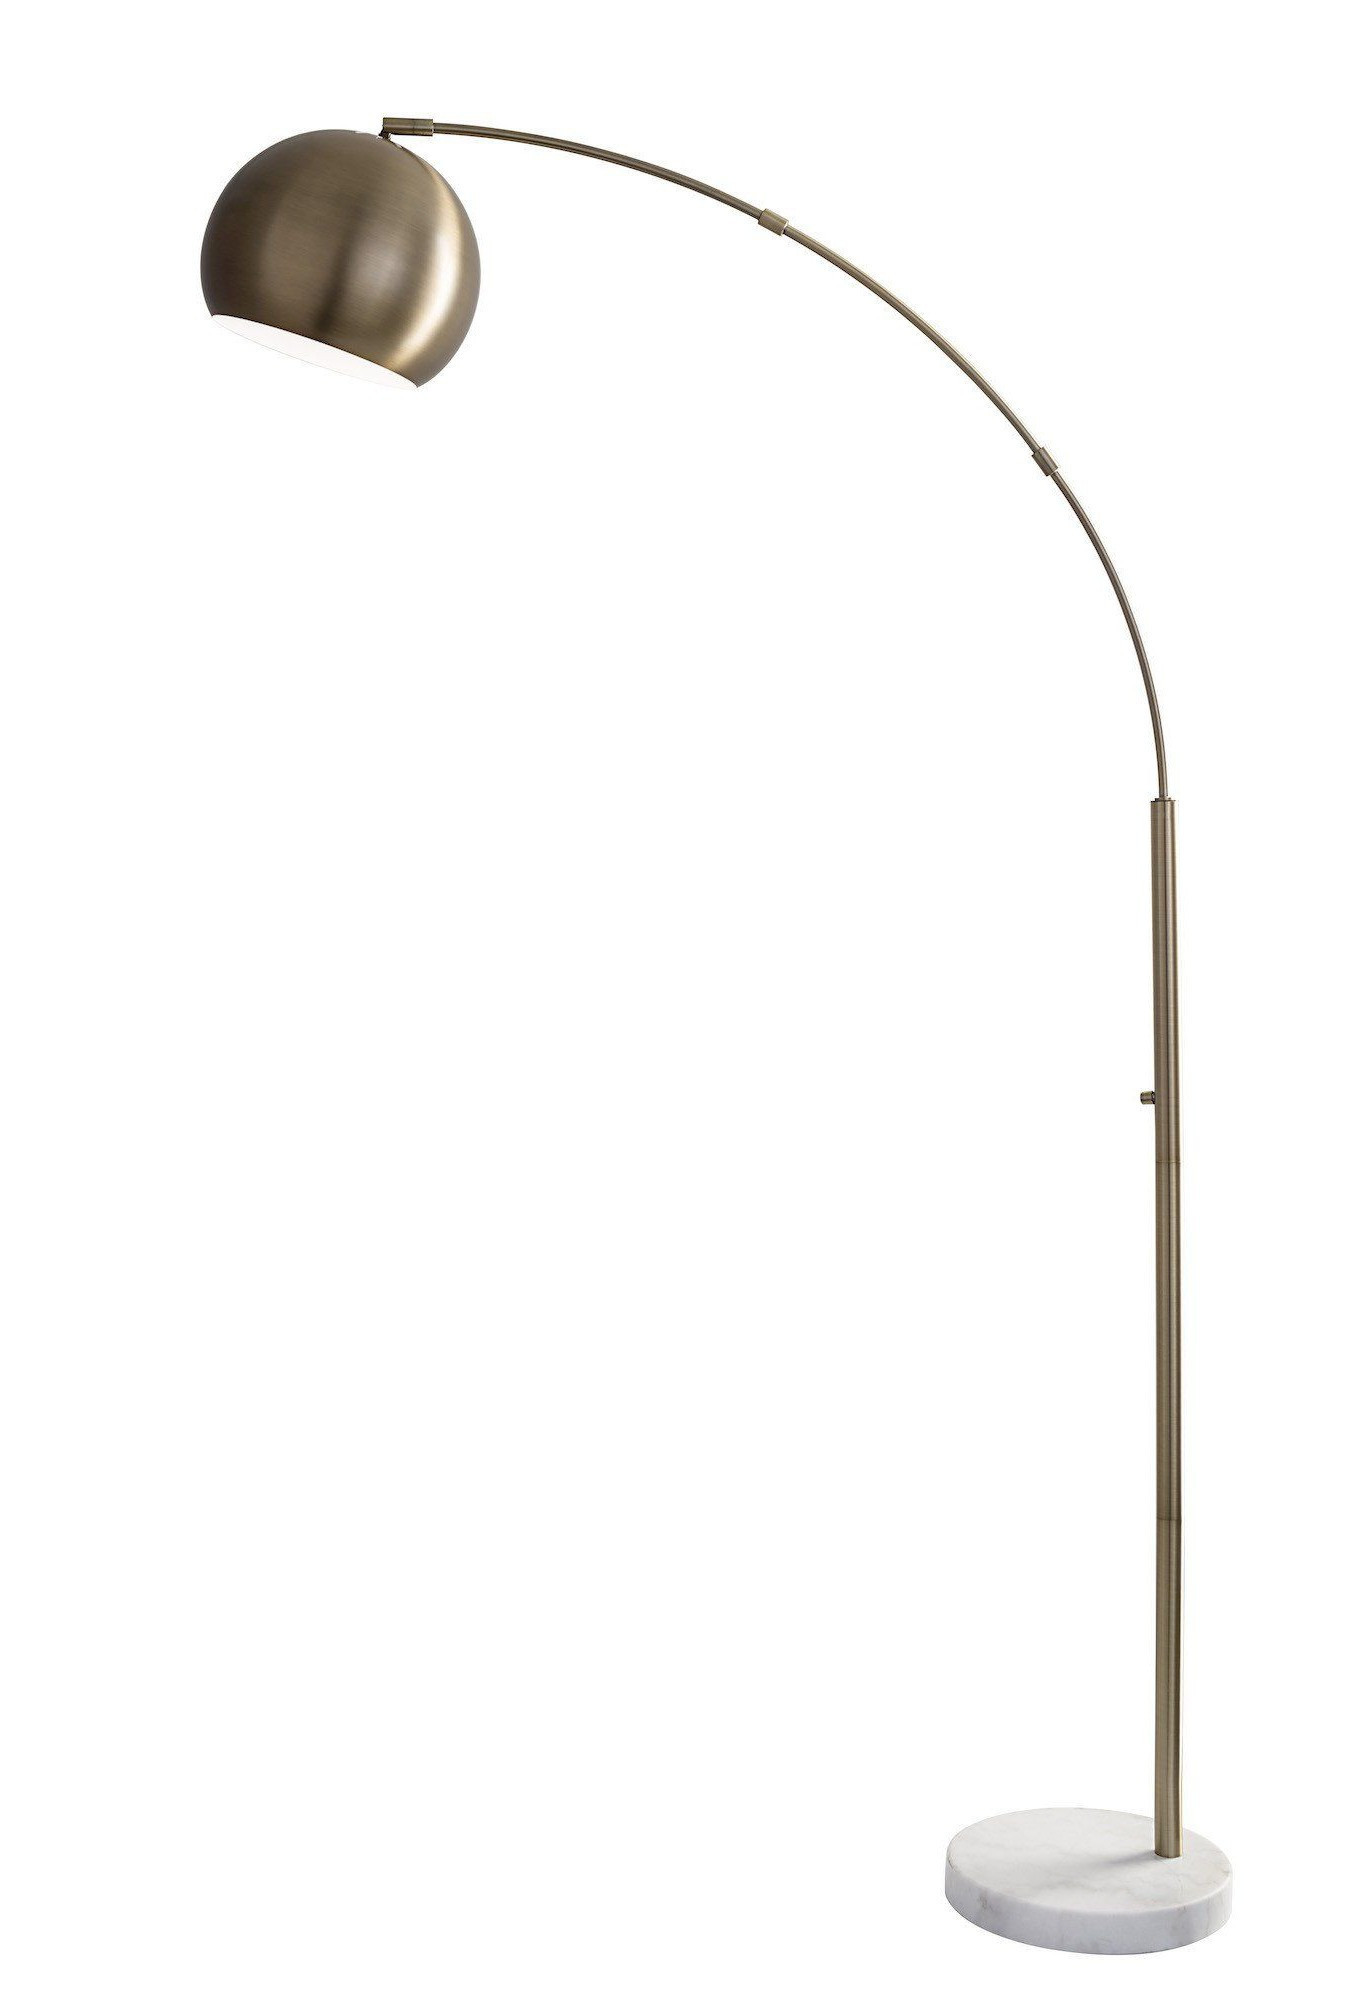 long skinny vases of antique brass floor lamp beautiful ao3 210h vases hurricane lamp regarding antique brass floor lamp luxury unique skinny floor lamp of antique brass floor lamp beautiful ao3